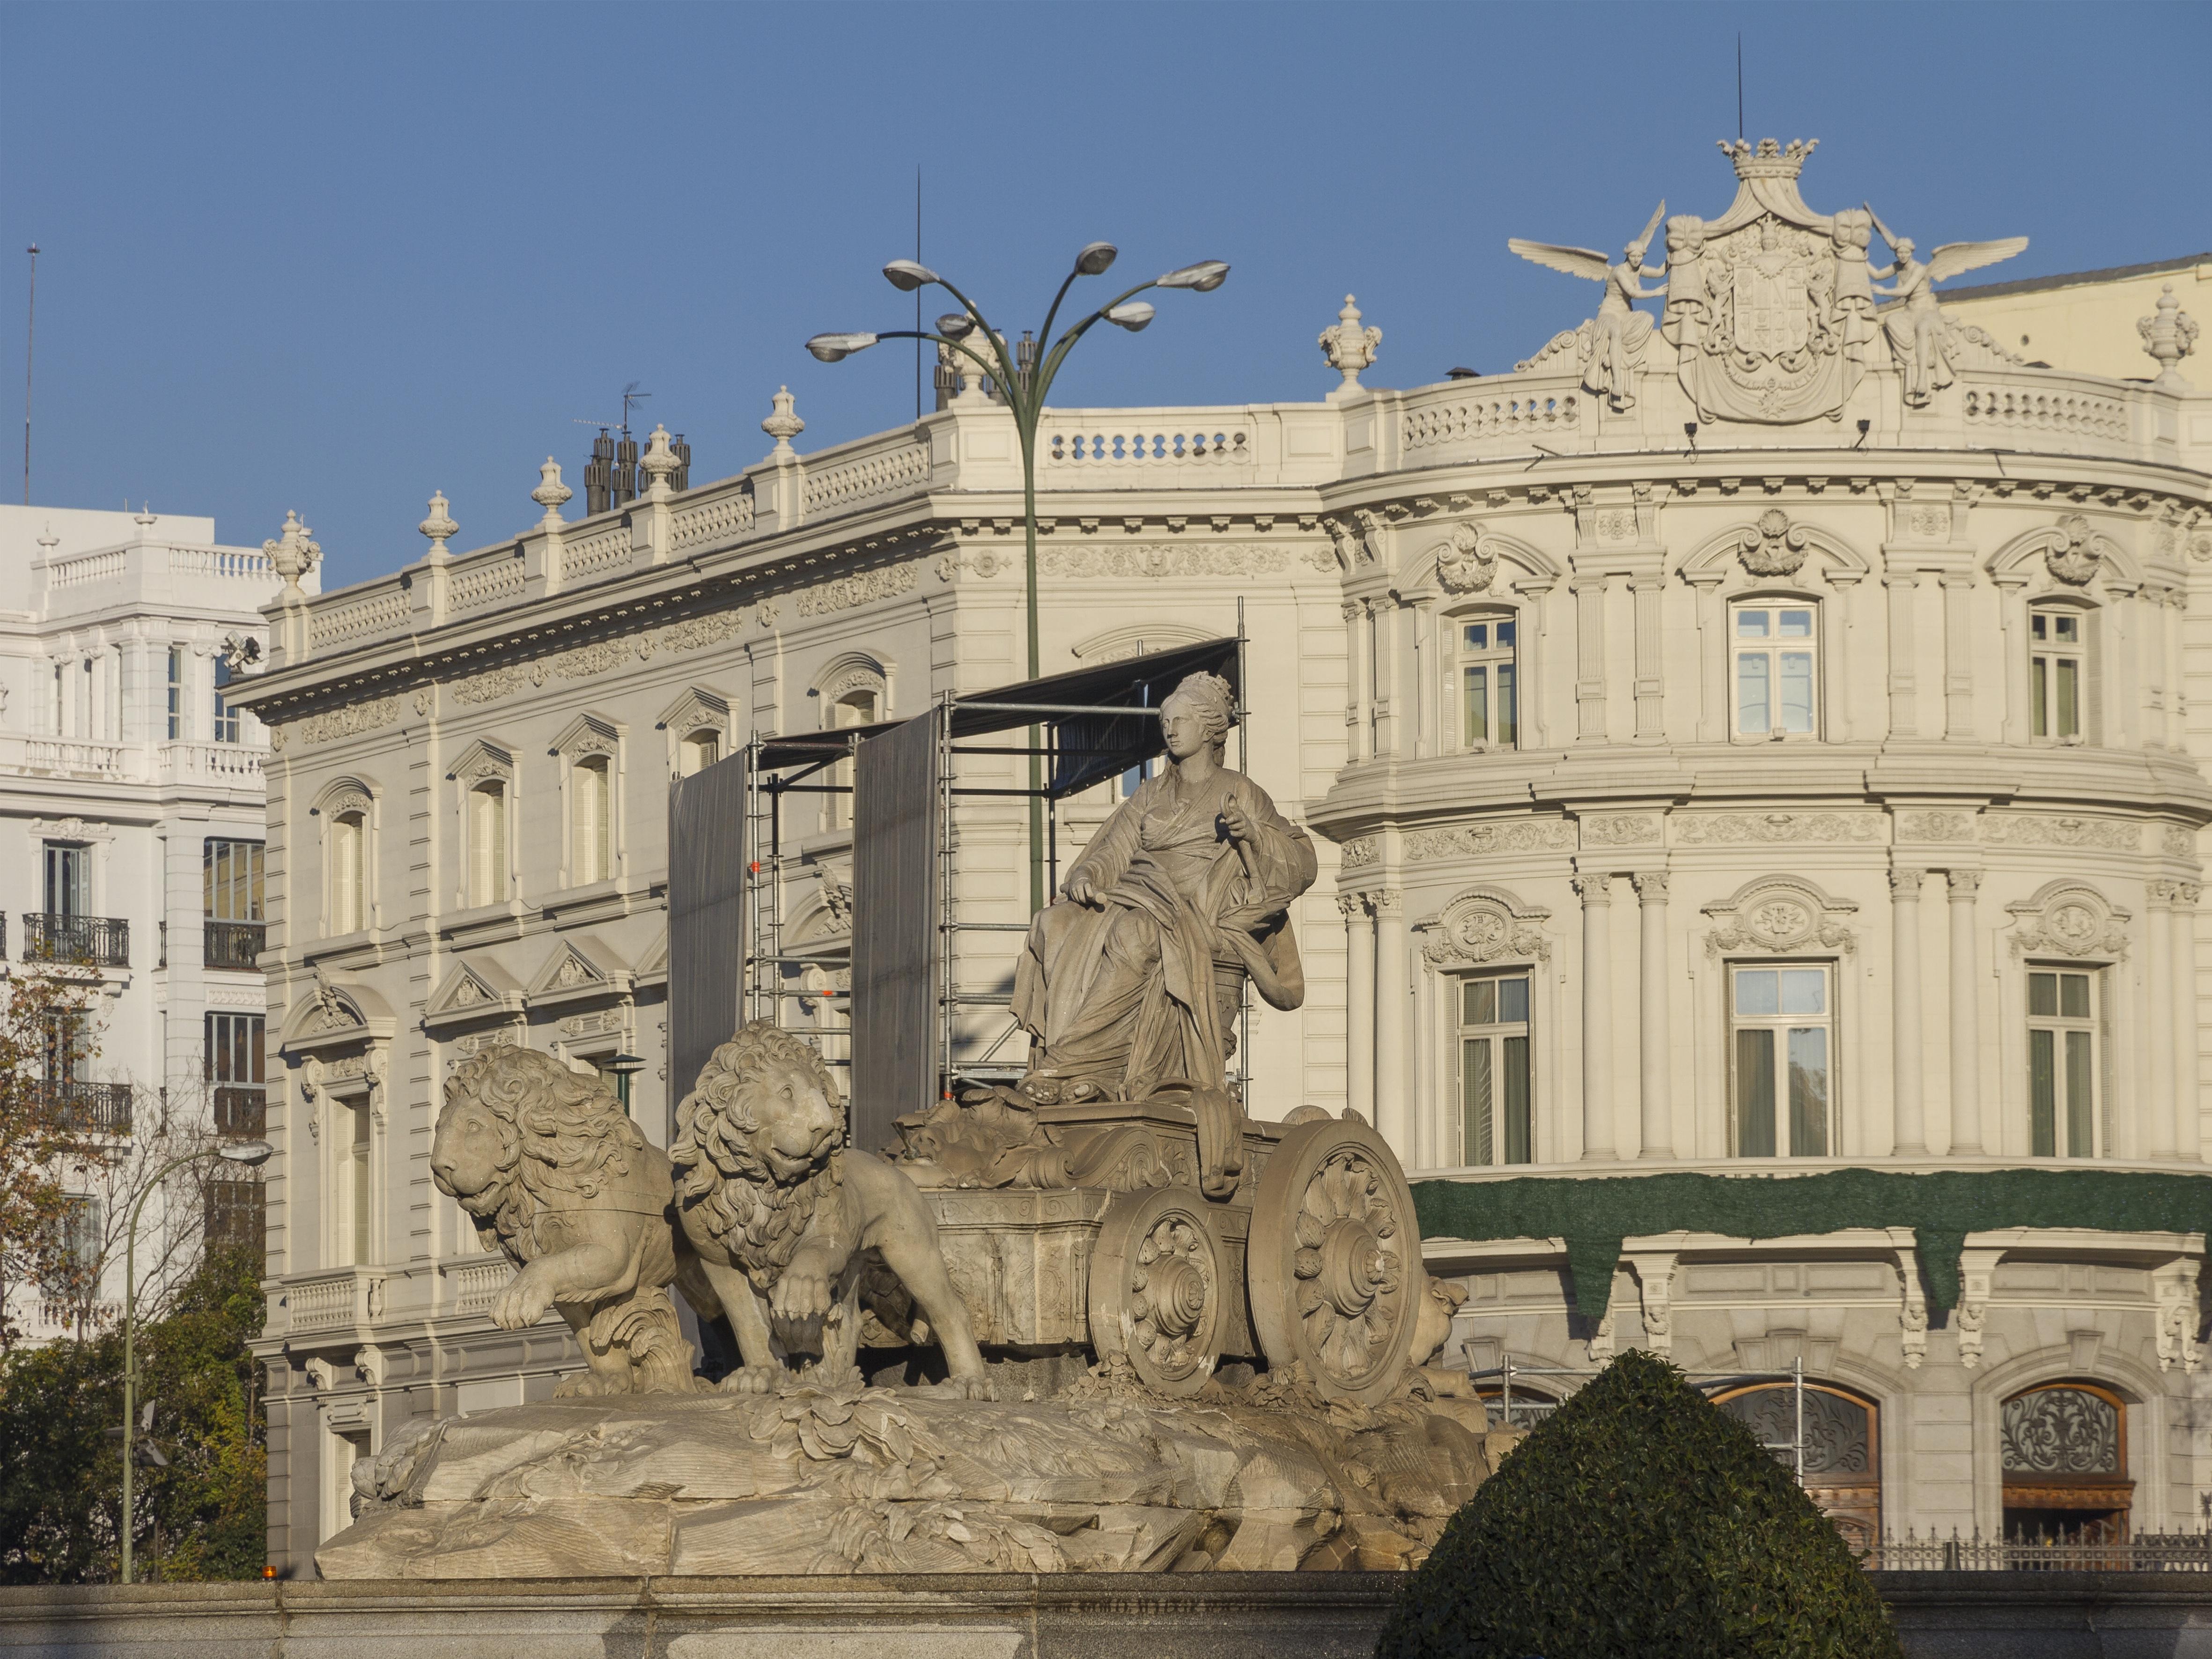 Fotos Gratis Arquitectura Edificio Palacio Monumento